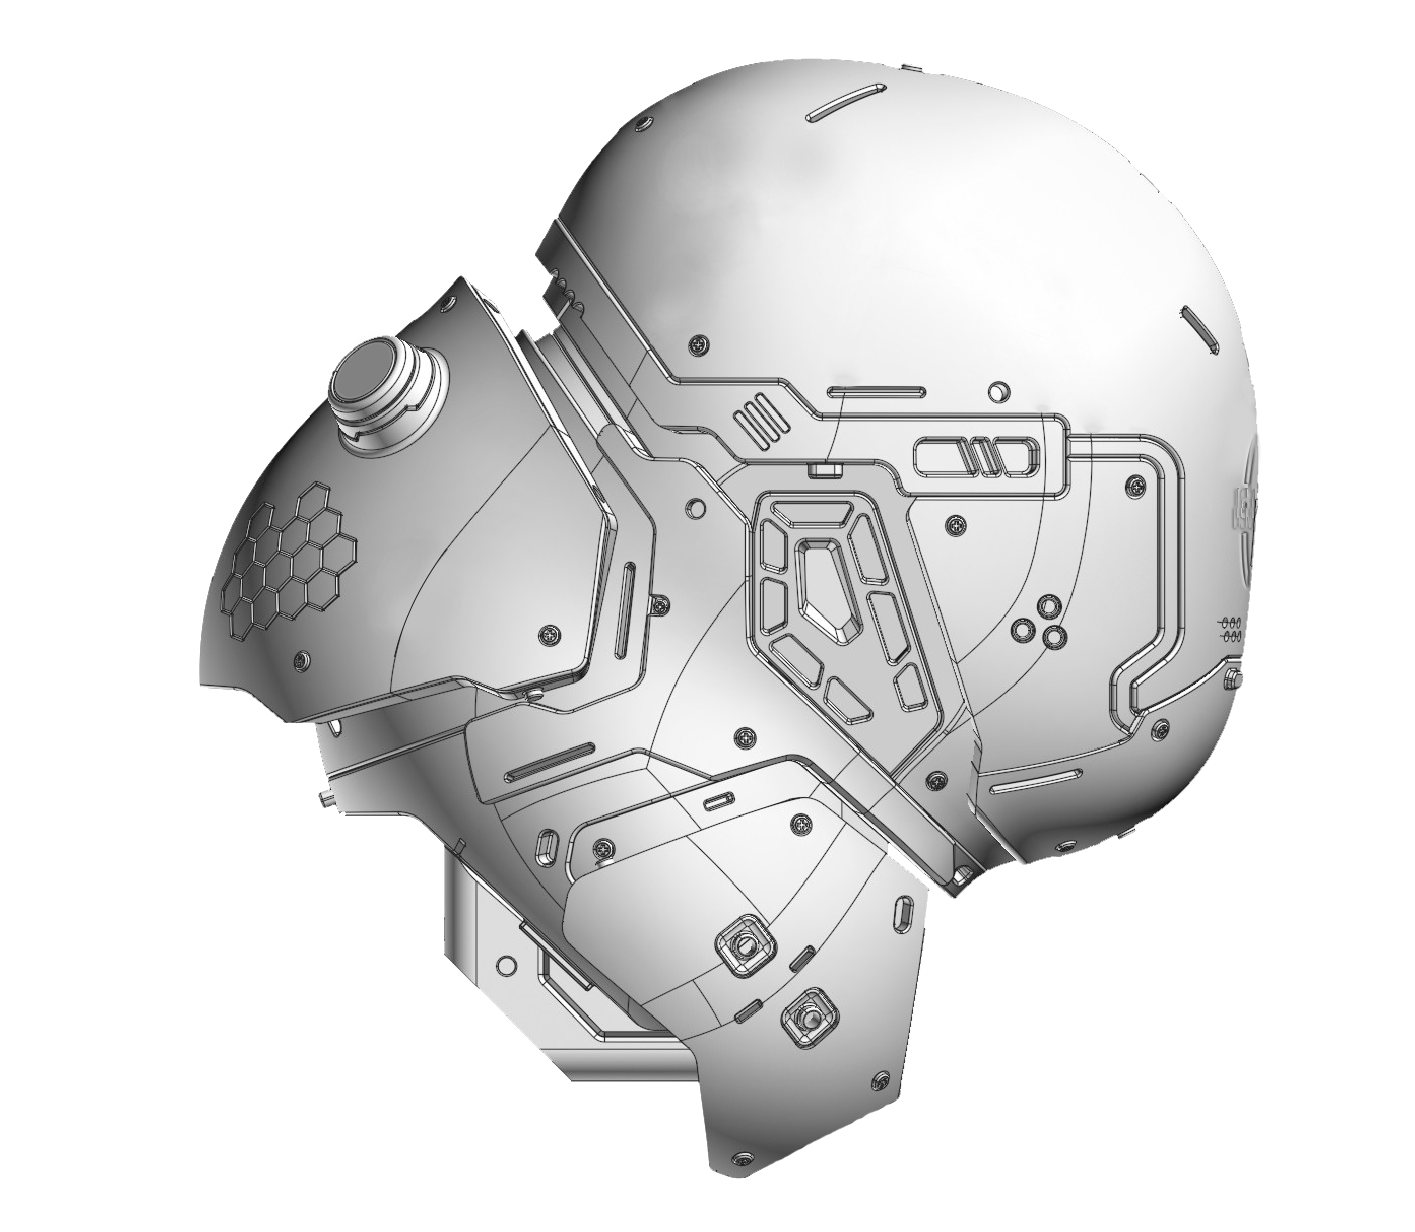 Besoin d'aide ! Impression 3D - Modélisation - Page 2 Img_2010